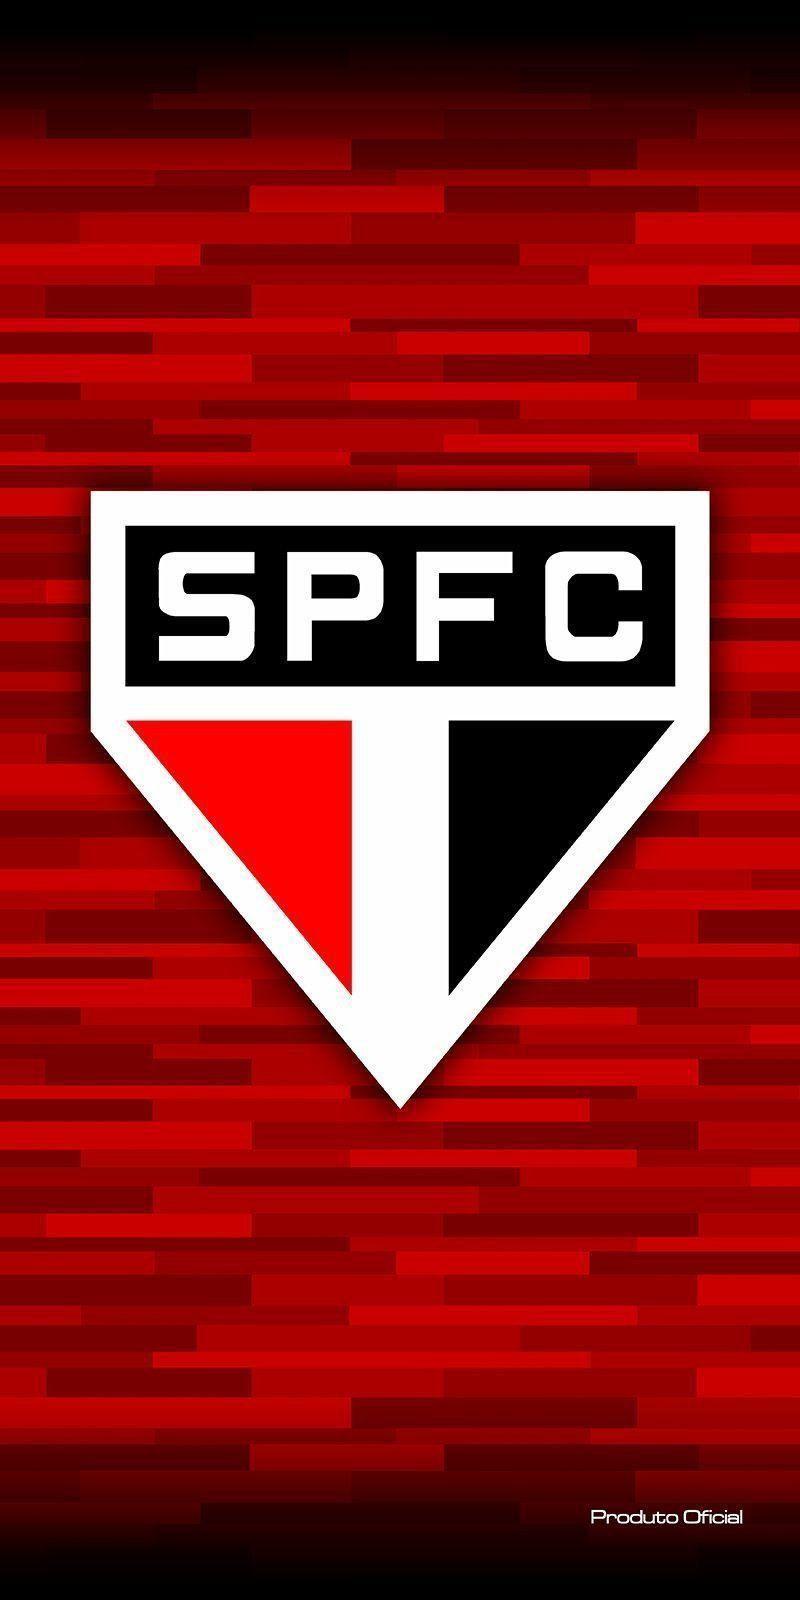 Toalha Aveludada Time de Futebol - São Paulo | Buettner